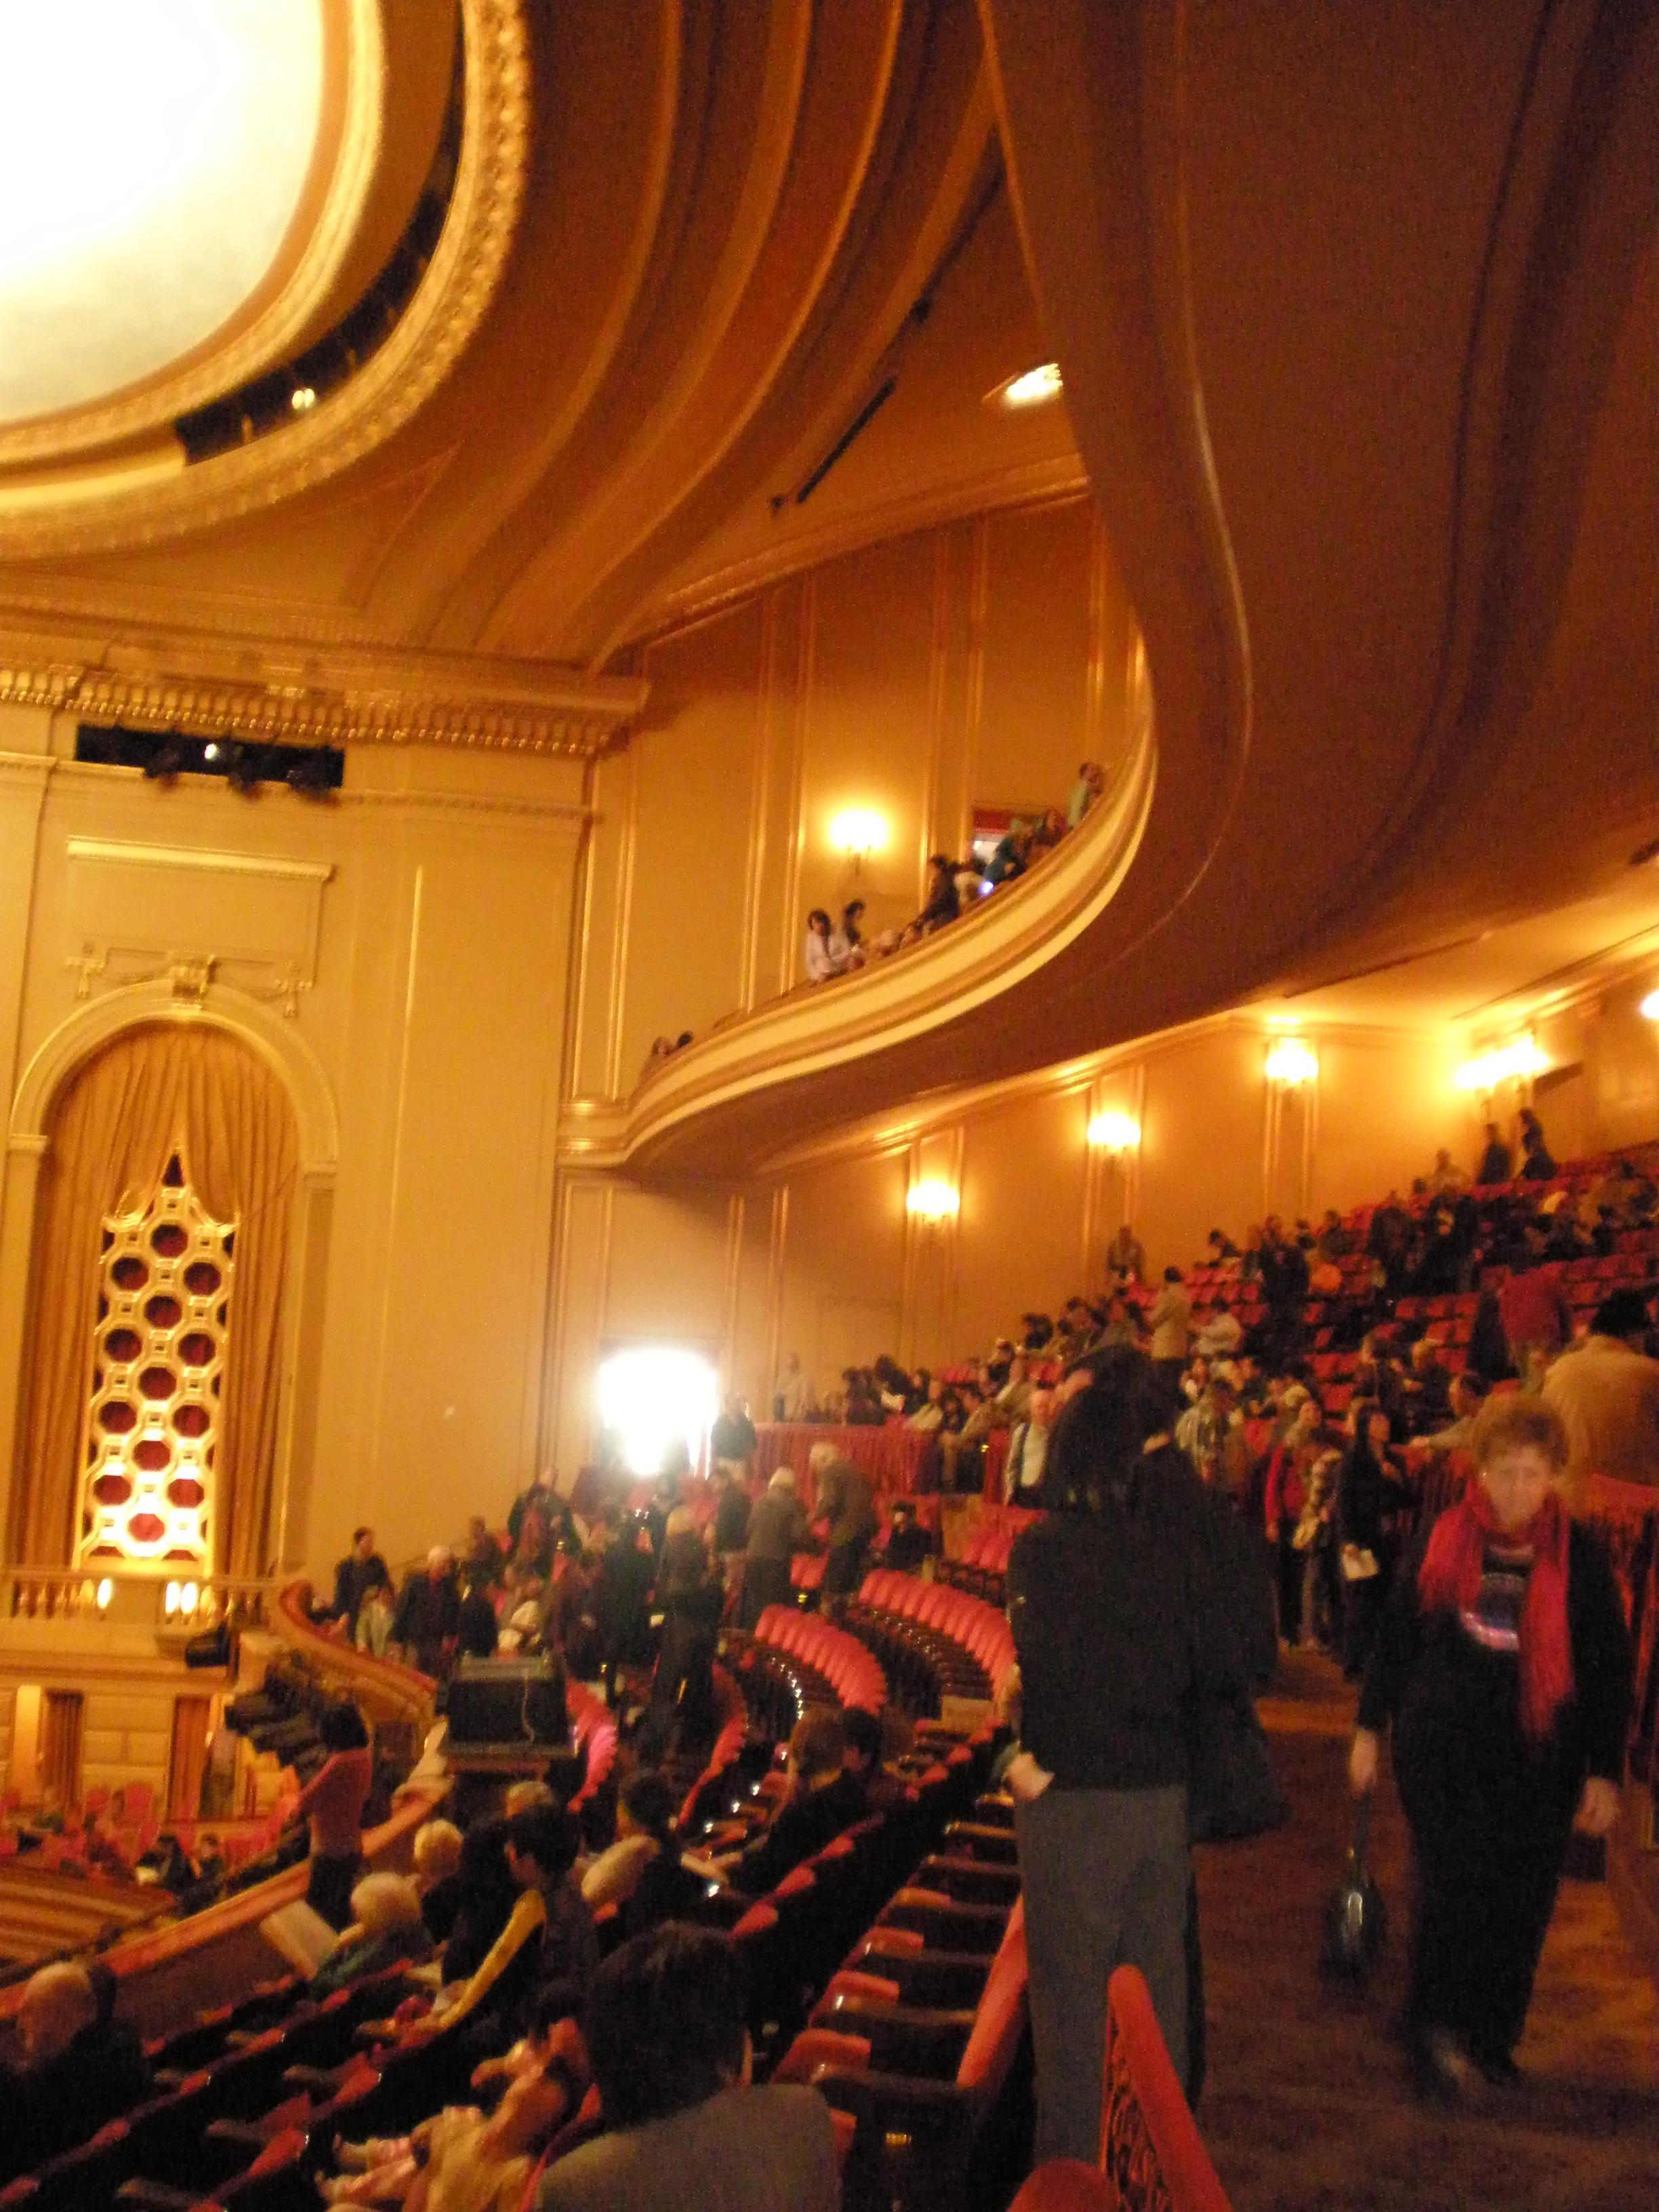 Lyric Opera House Seating Chart Lyric Opera House Seating